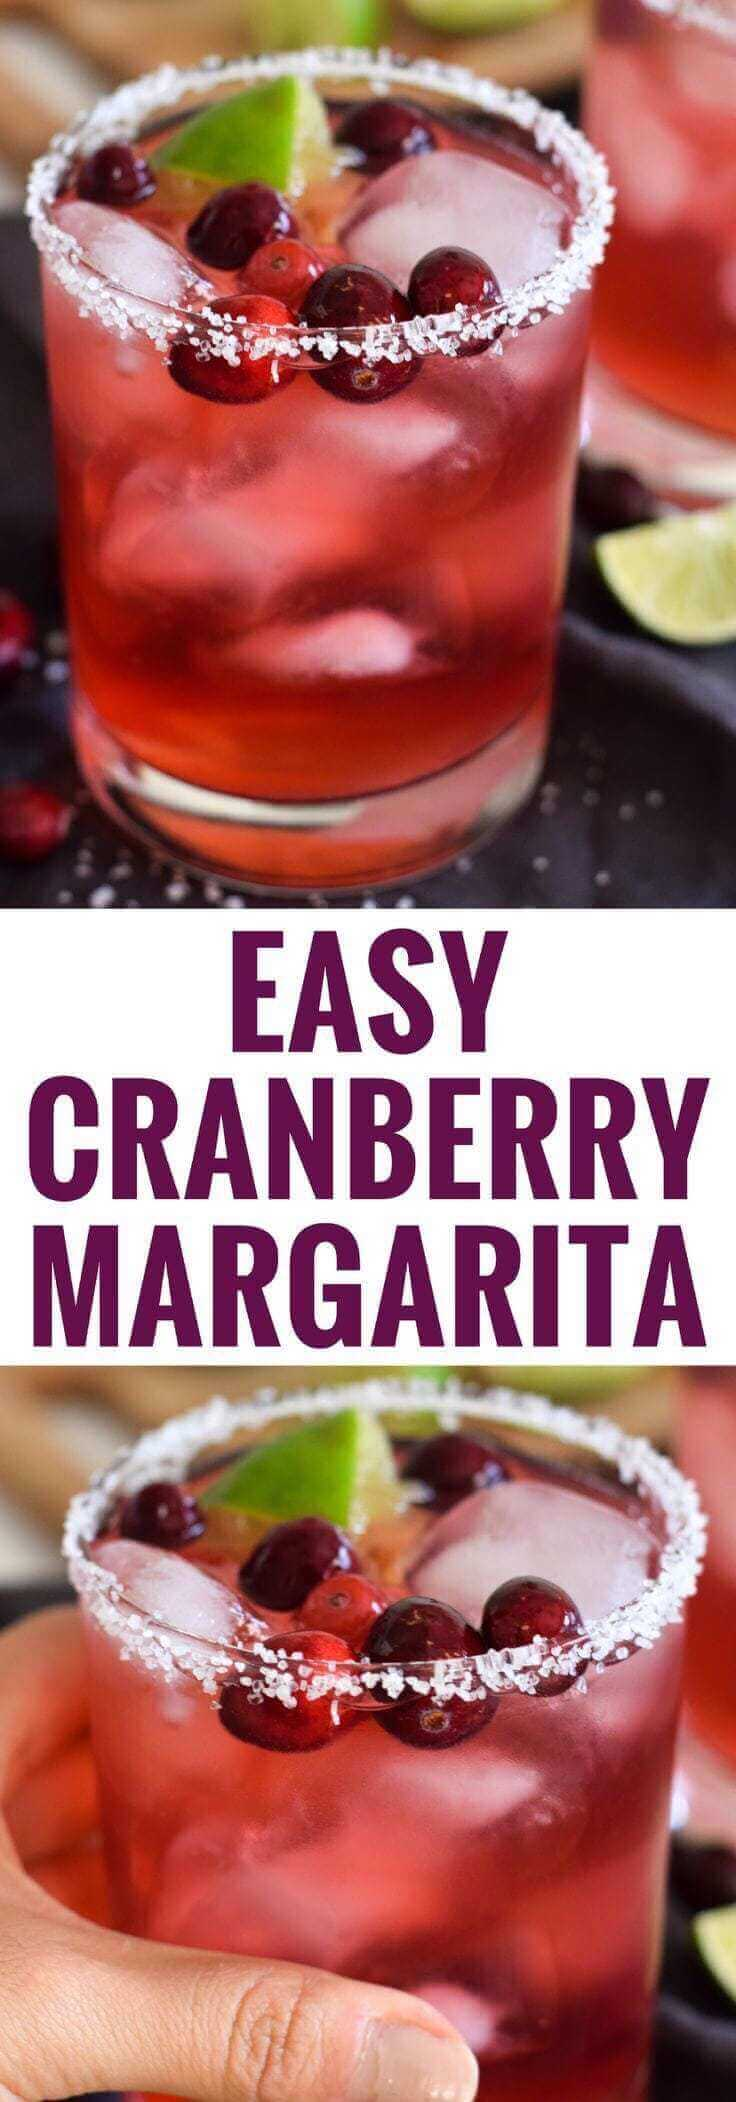 Easy Cranberry Margarita